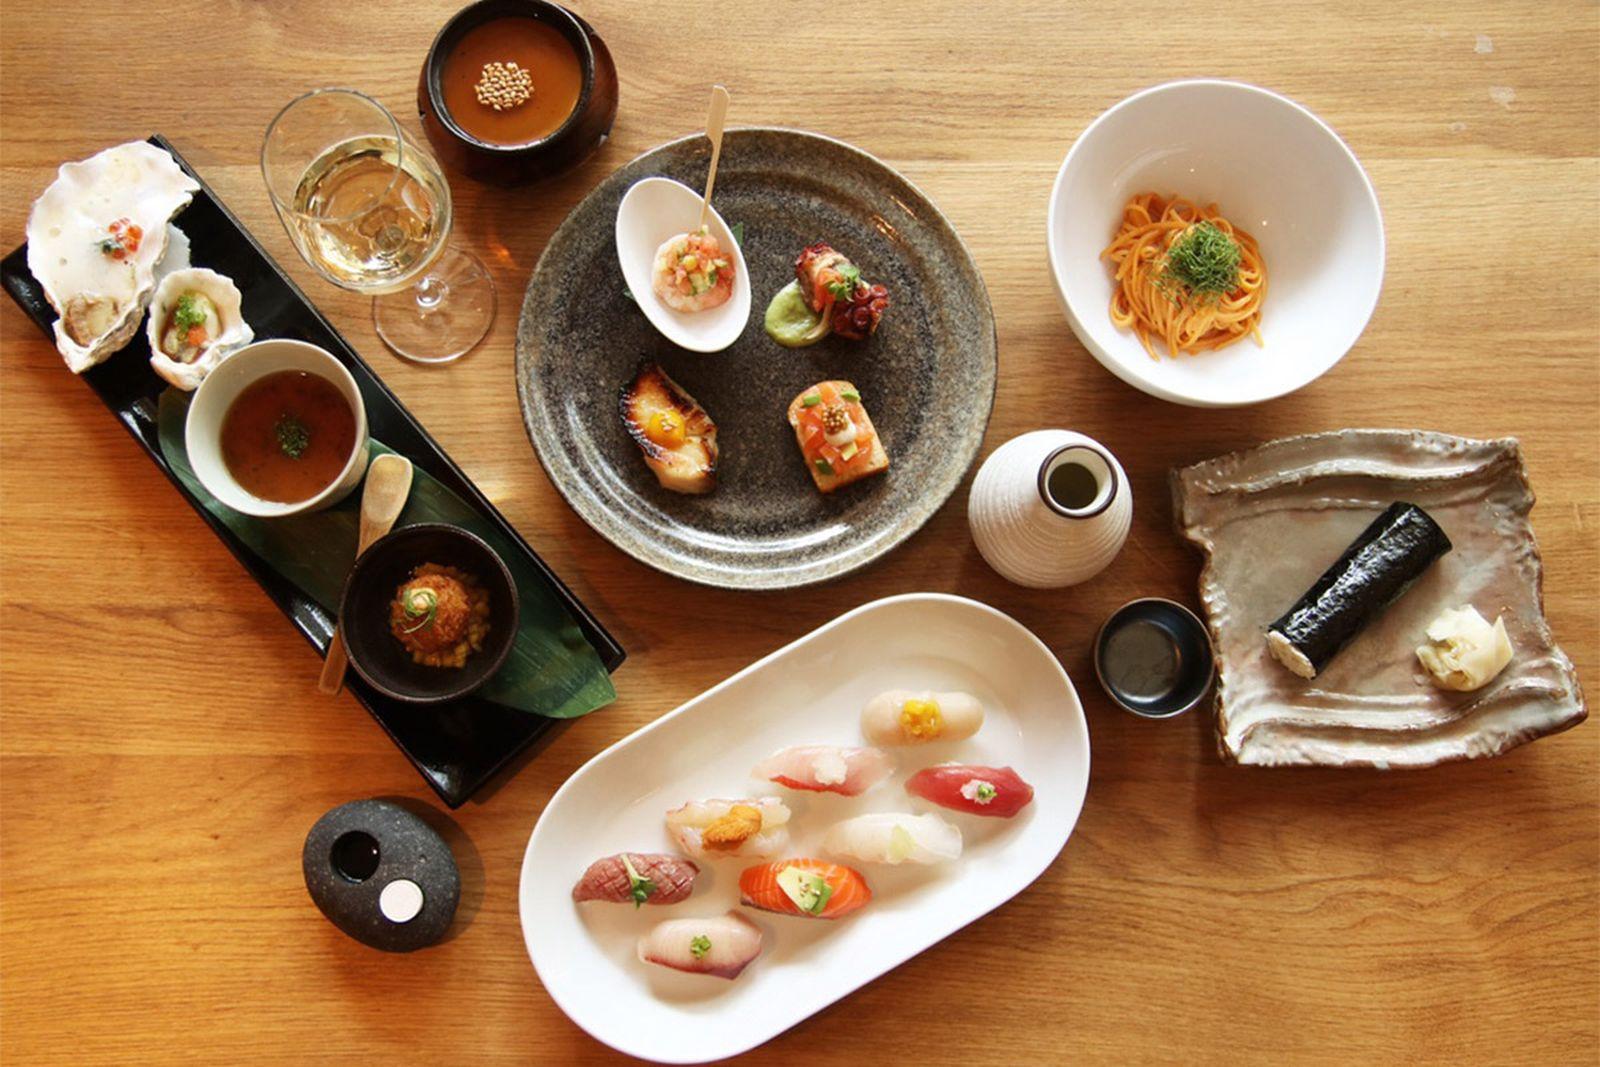 nyc mid range restaurants domo domo AMEX american express platinum food & drink